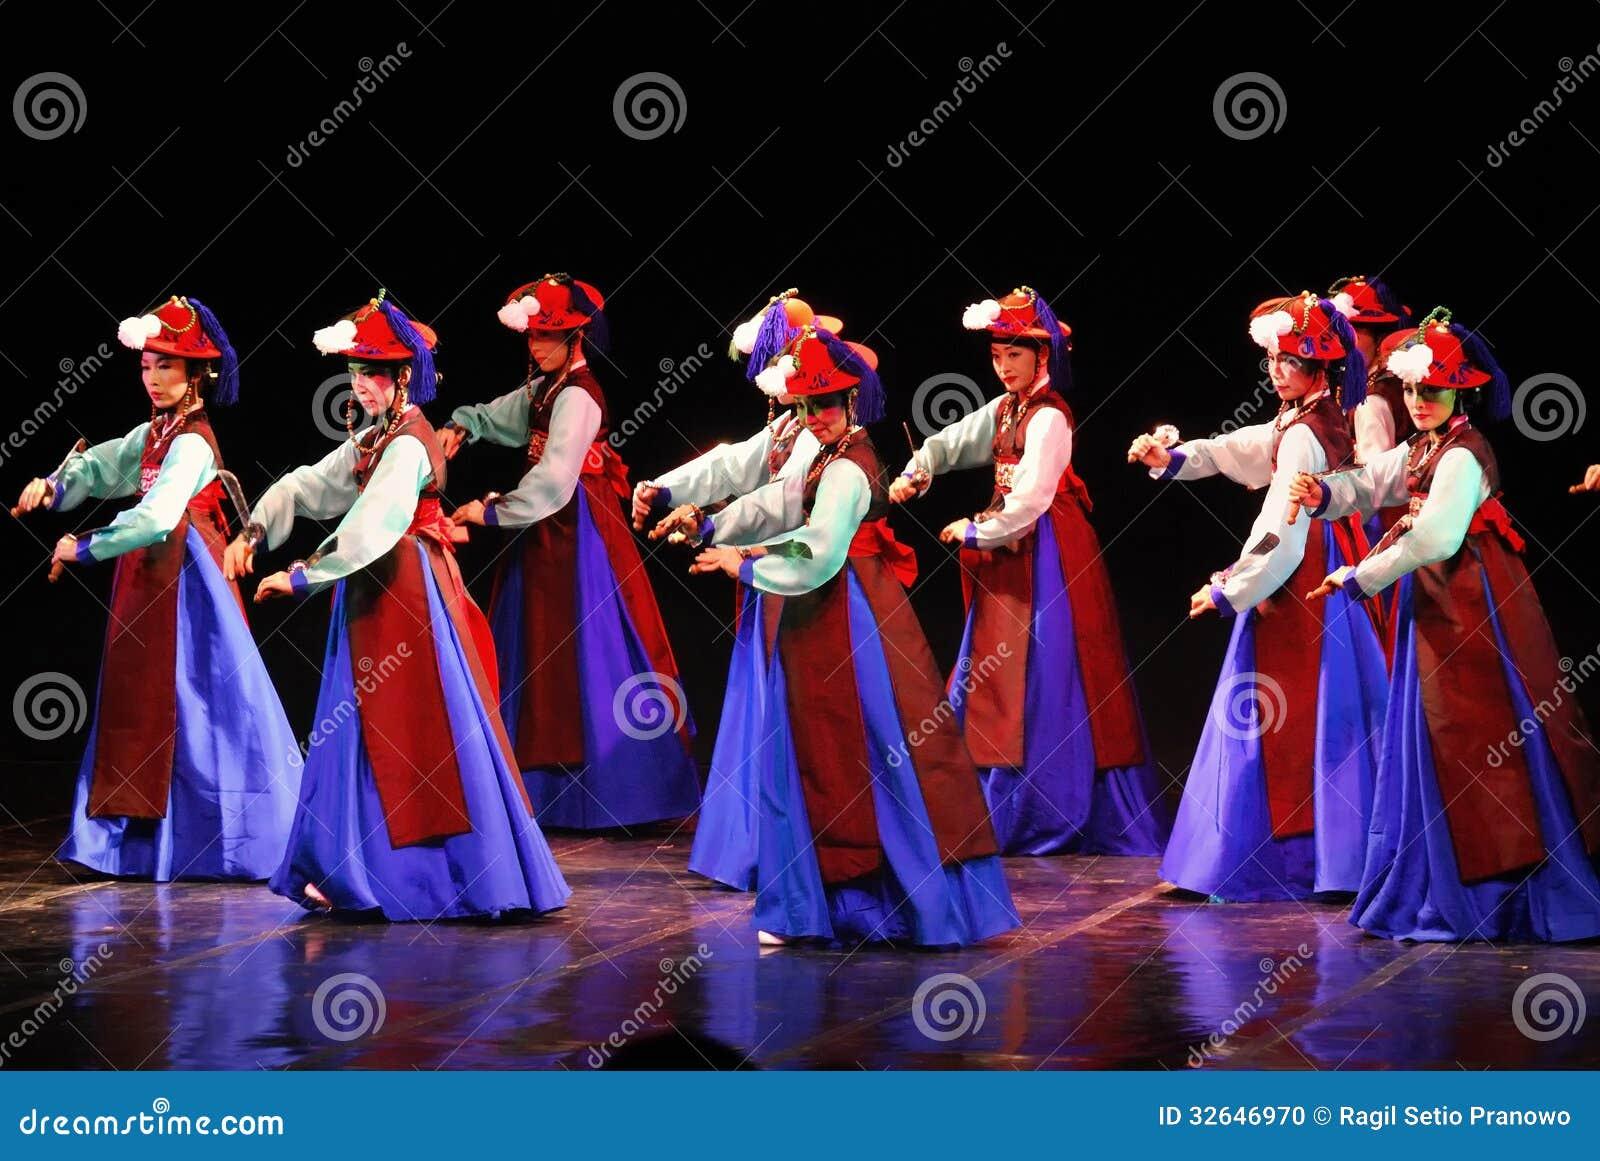 Performance Of Busan Korean Traditional Dance Editorial Image  Image: 32646970